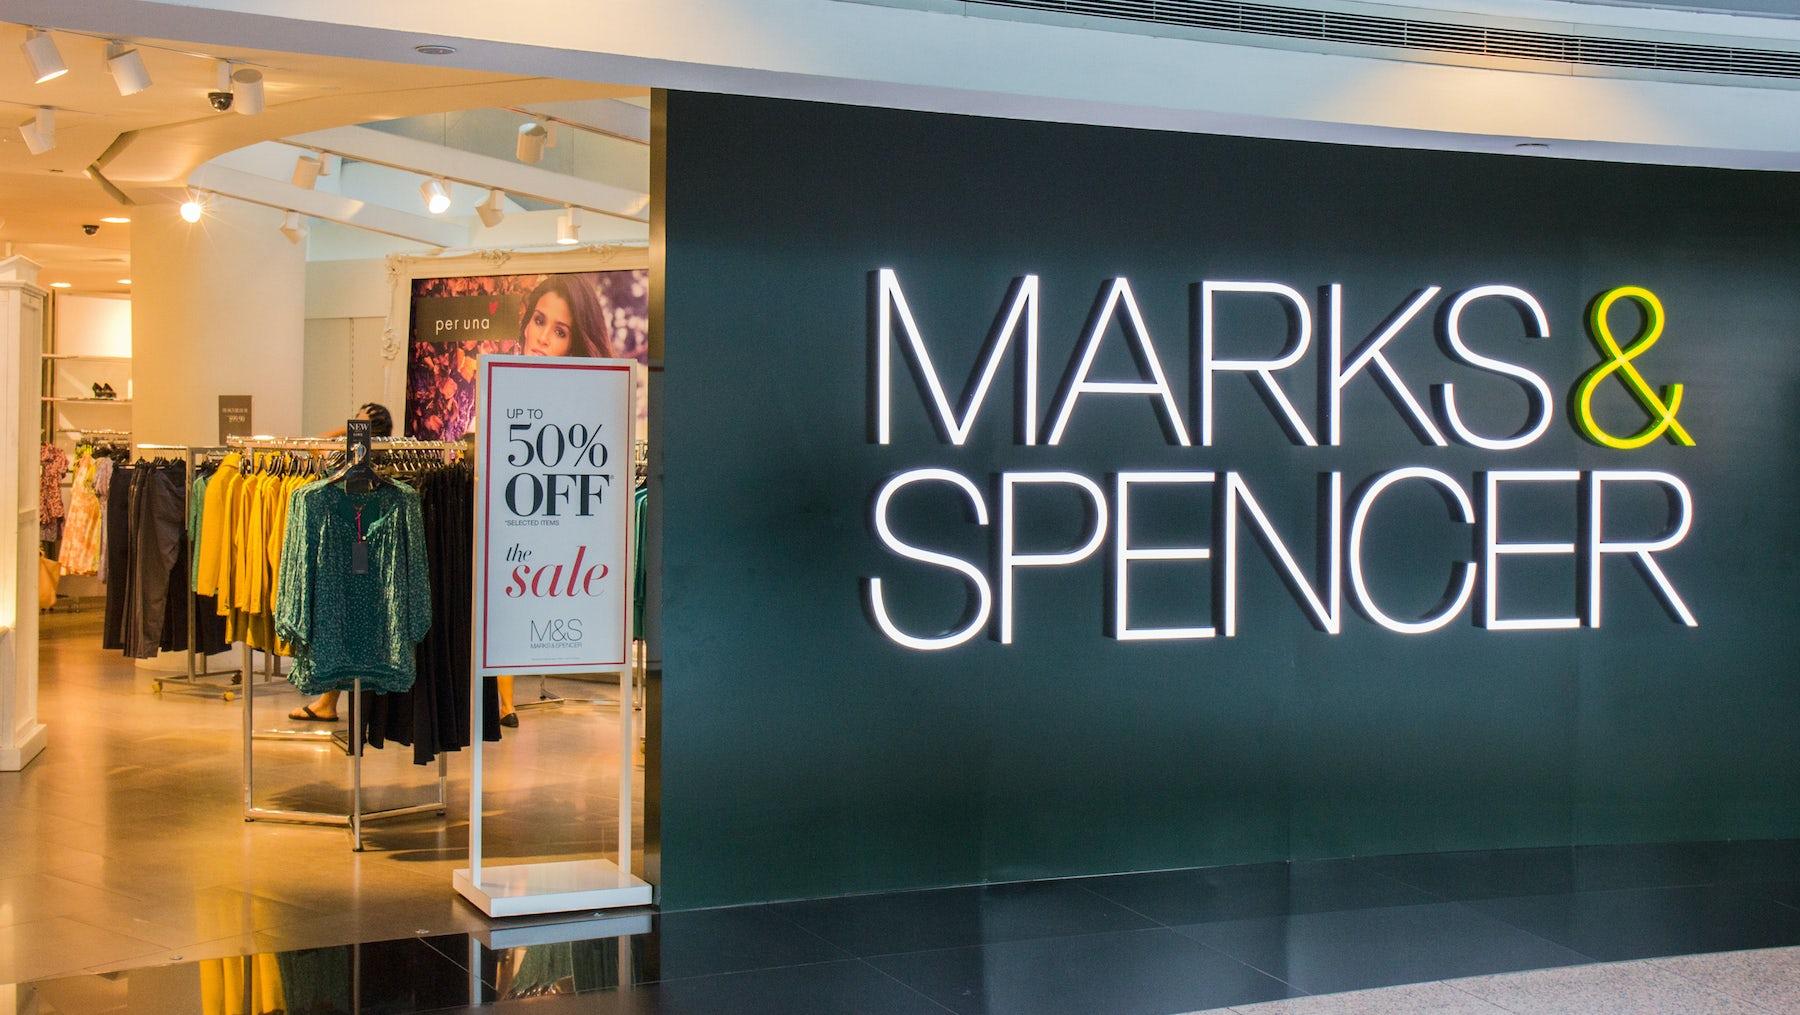 Marks & Spencer Store | Source: Shutterstock